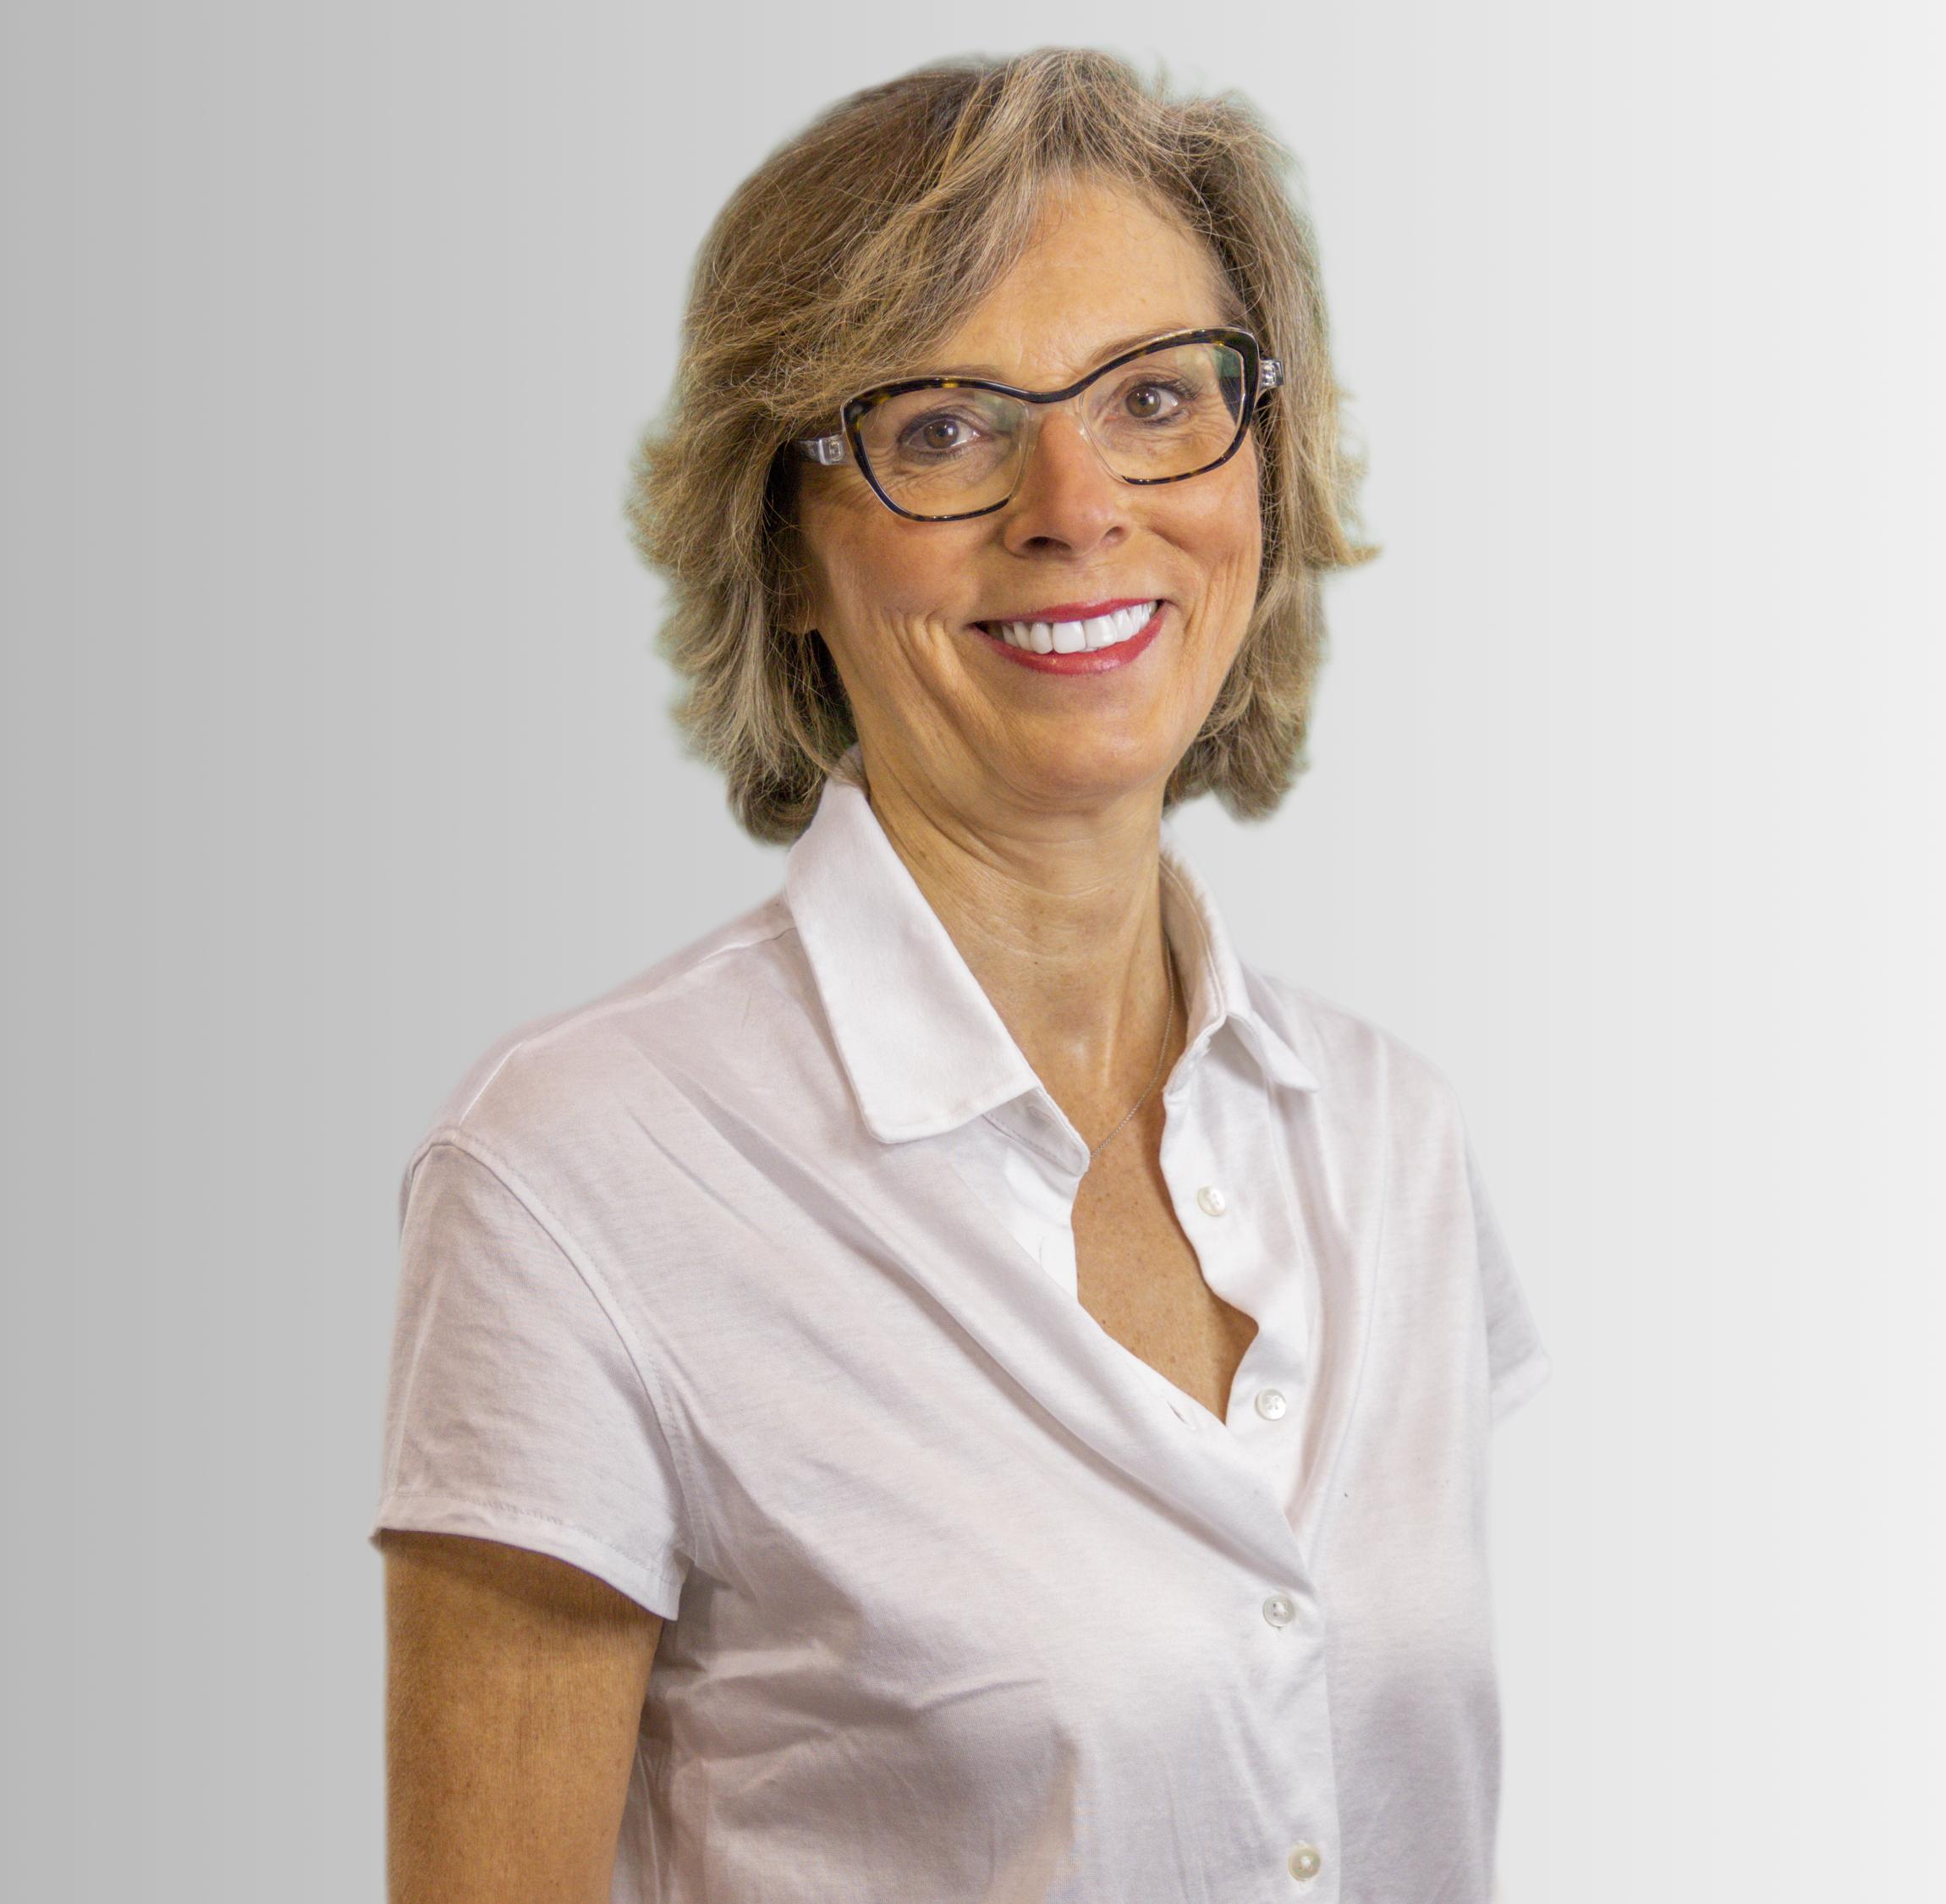 Marie Vezy